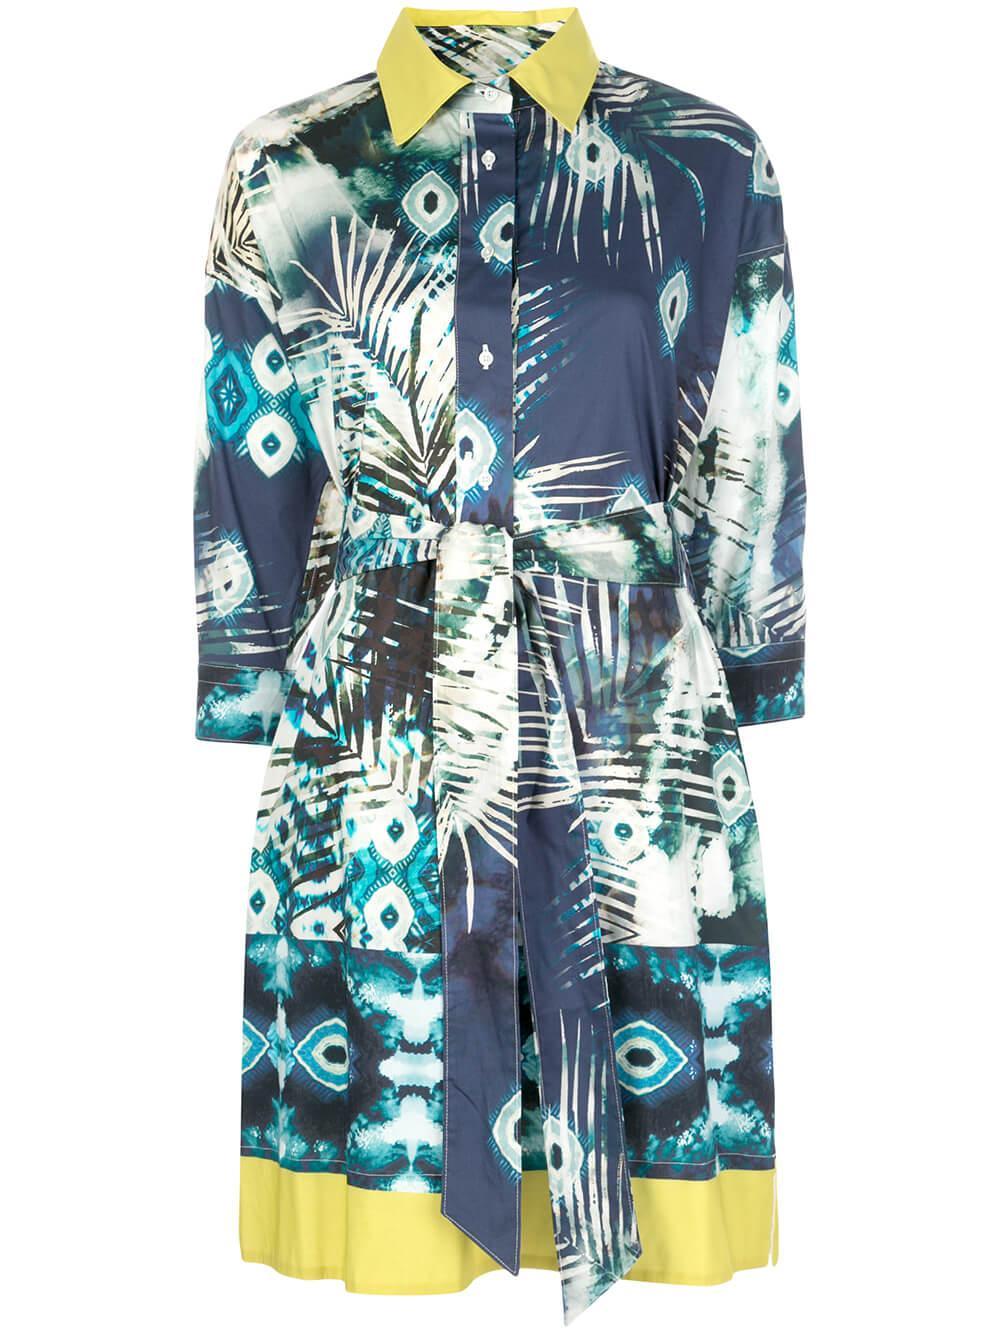 Printed Stretch Poplin Short Dress Item # 8EKATERY30-99